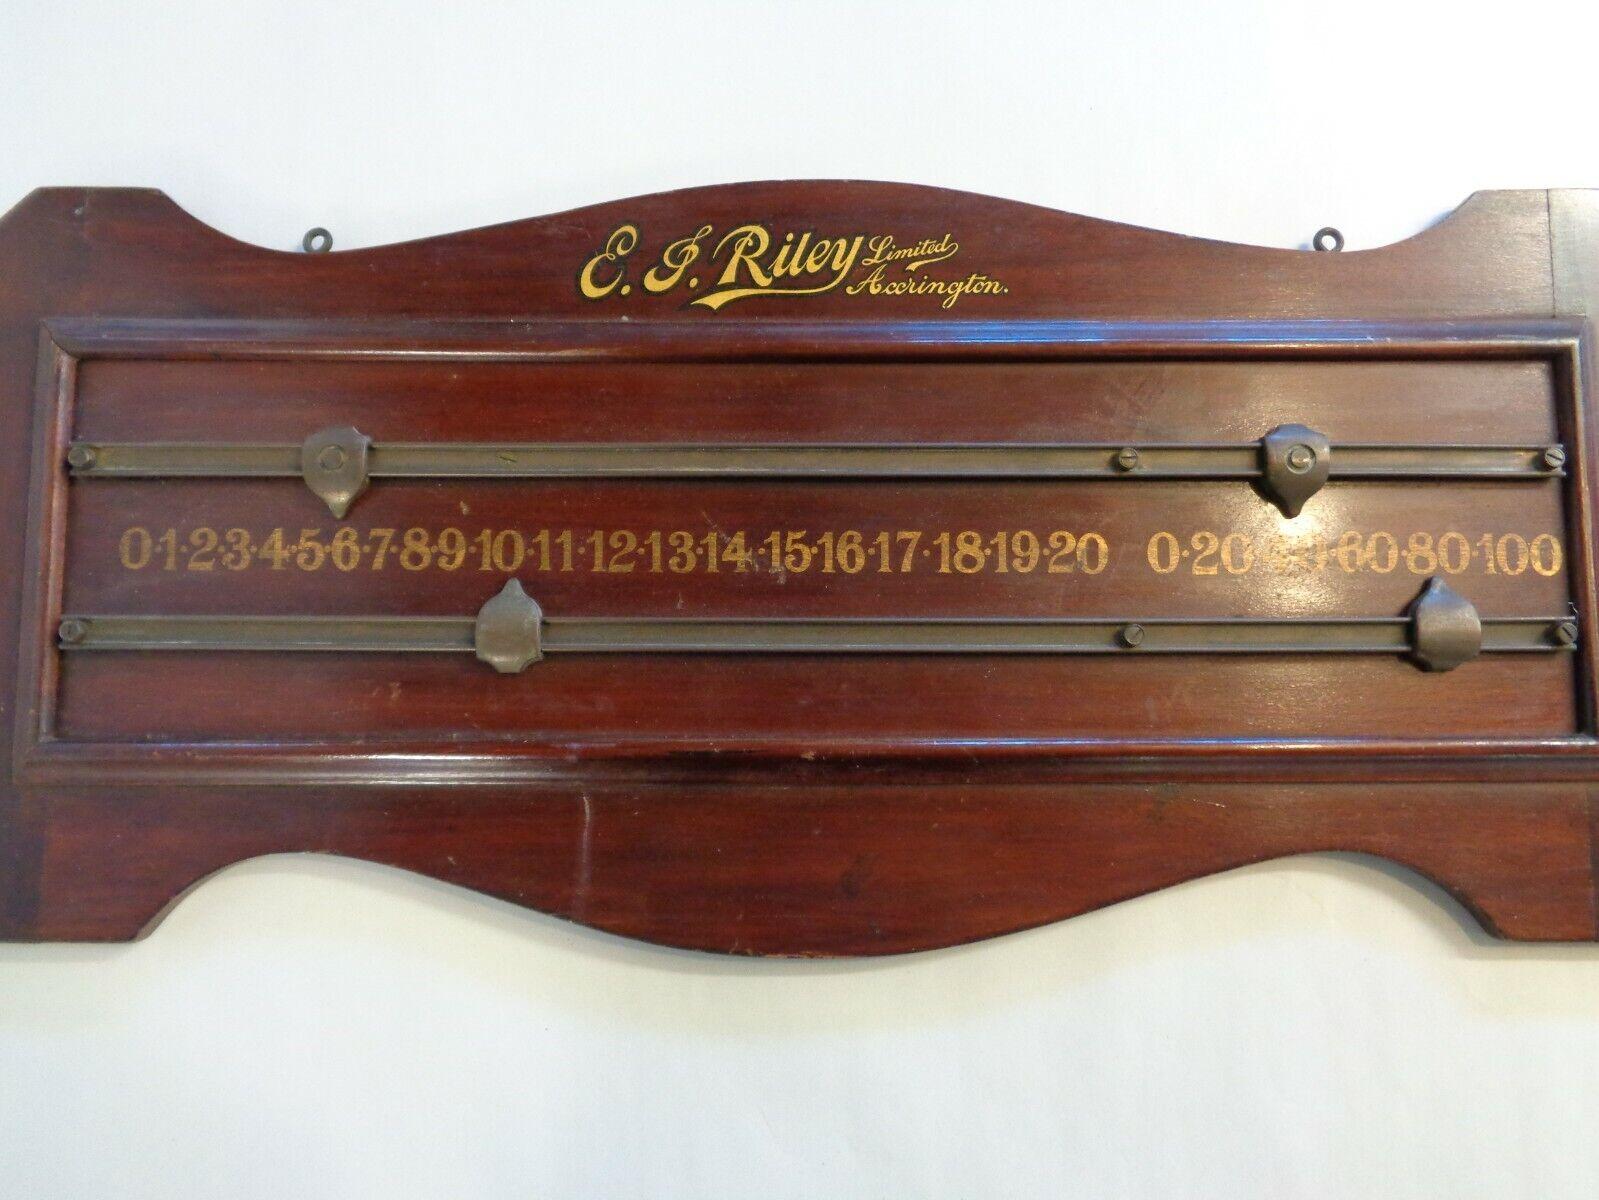 Vintage Snooker / Billiards Scoreboard - E. J. Riley Limited, Accrington